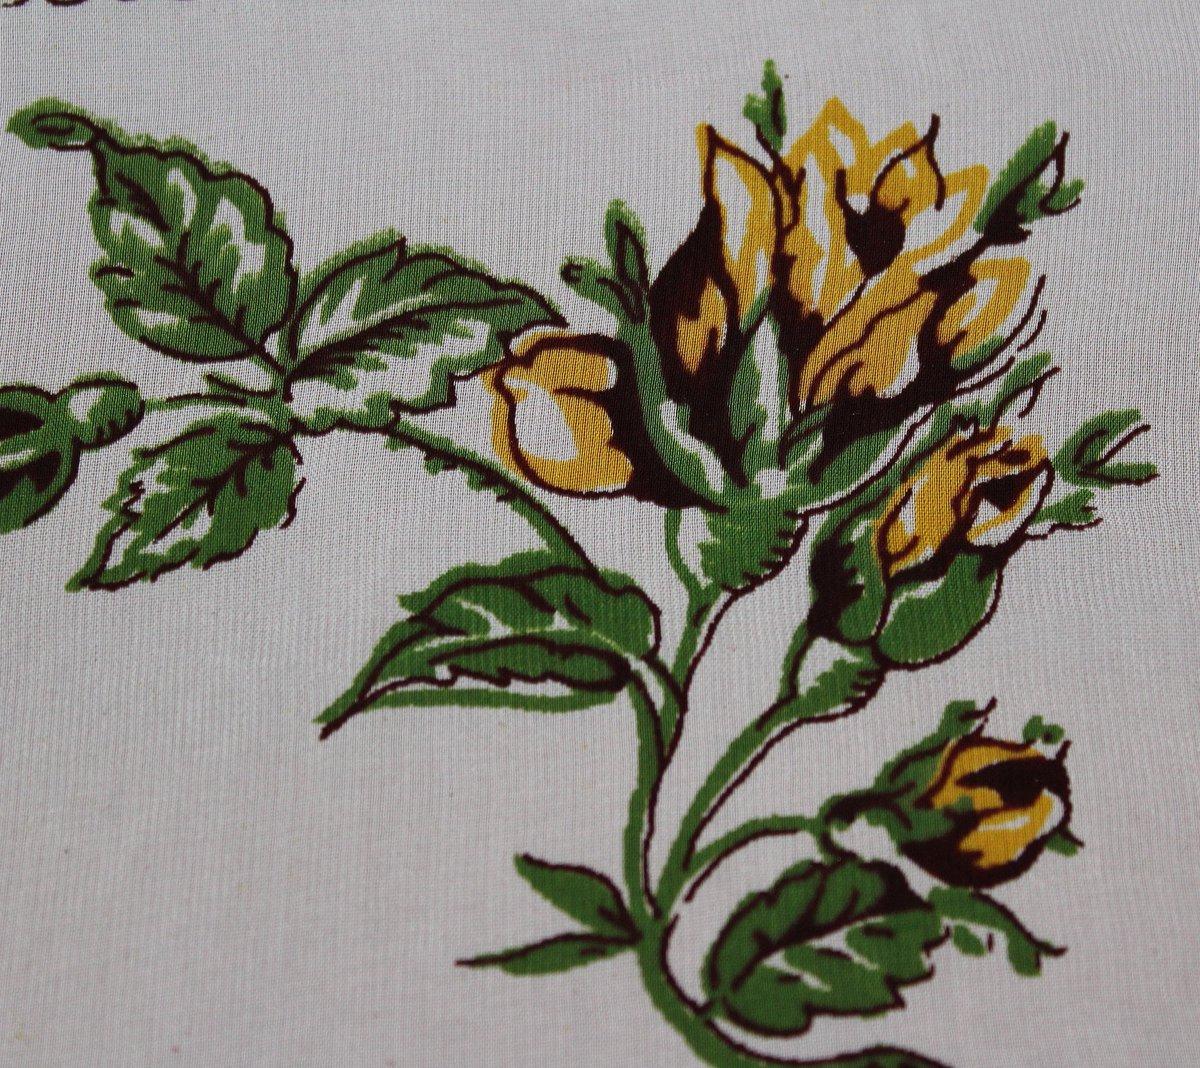 Vintage Floral Hankie, Yellow Rose Handkerchief, Flowers, White, Green, Brown, Mid Century Modern, Women's Vintage Apparel Rolled Edge Retro http://tuppu.net/346144c #Etsy #ImagineQuiltsAndMore #FloralHankiepic.twitter.com/Jwpc9d4QoP